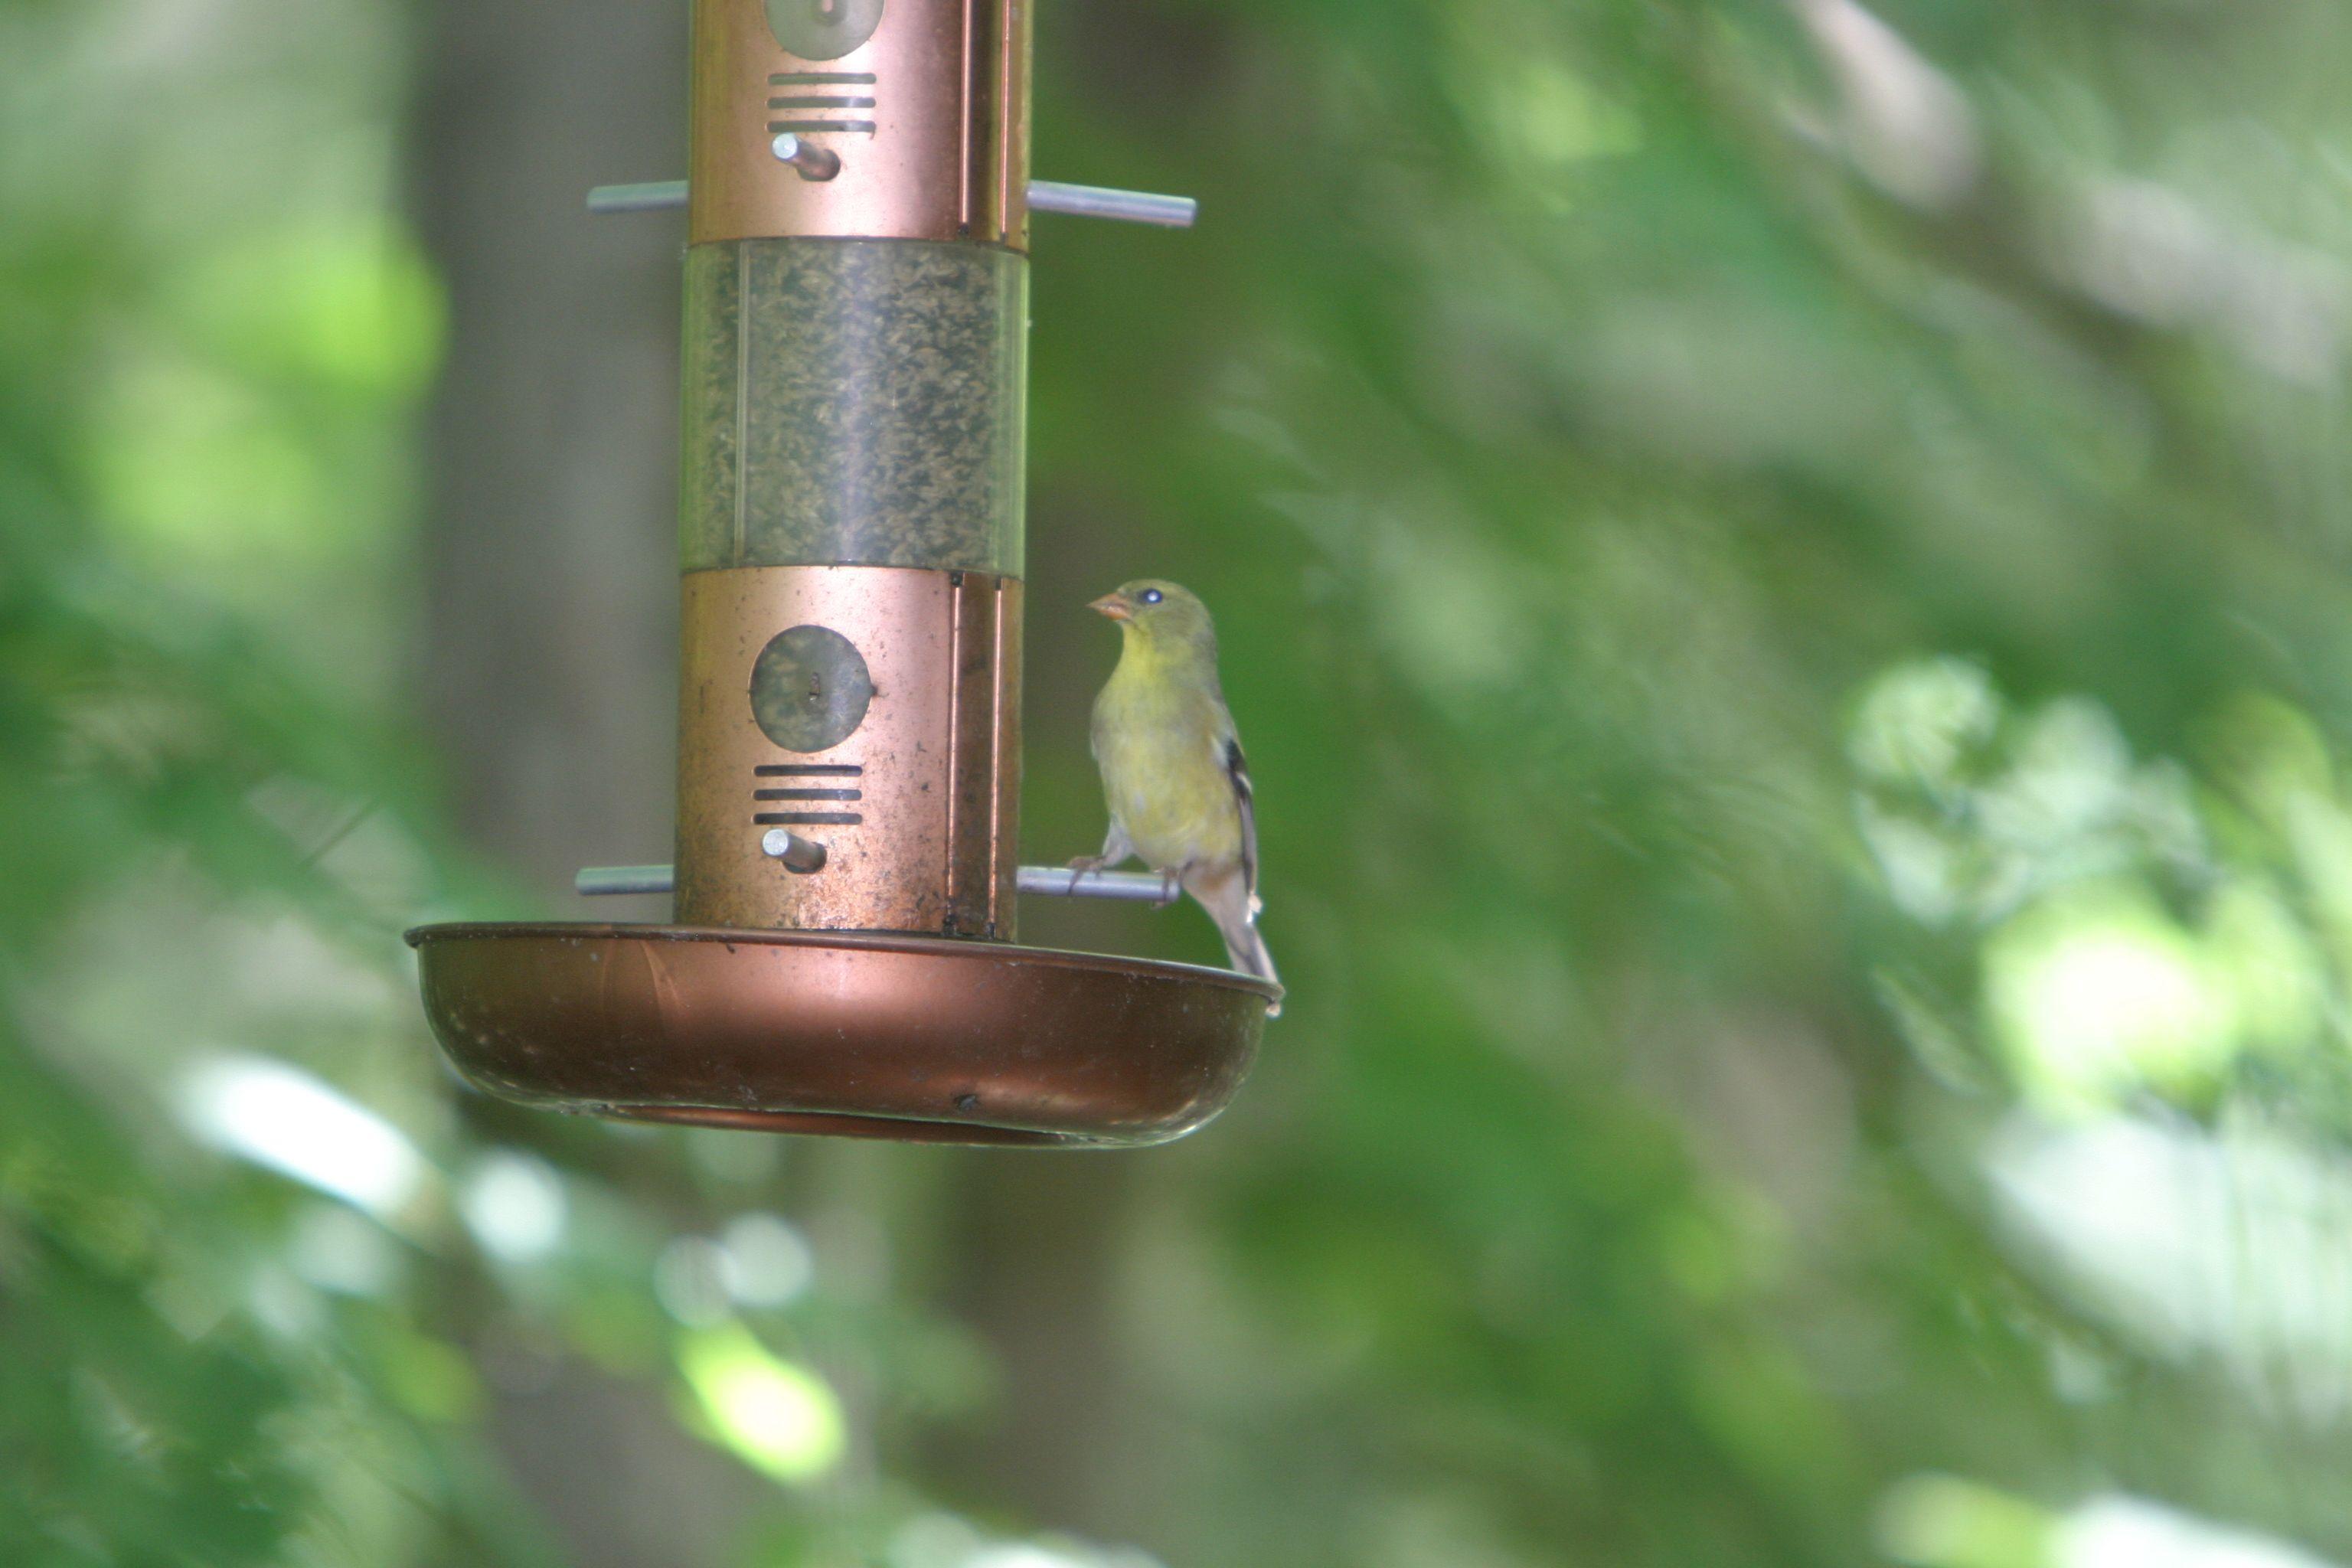 Adorable bird at the feeder.  www.innsbrook-resort.com